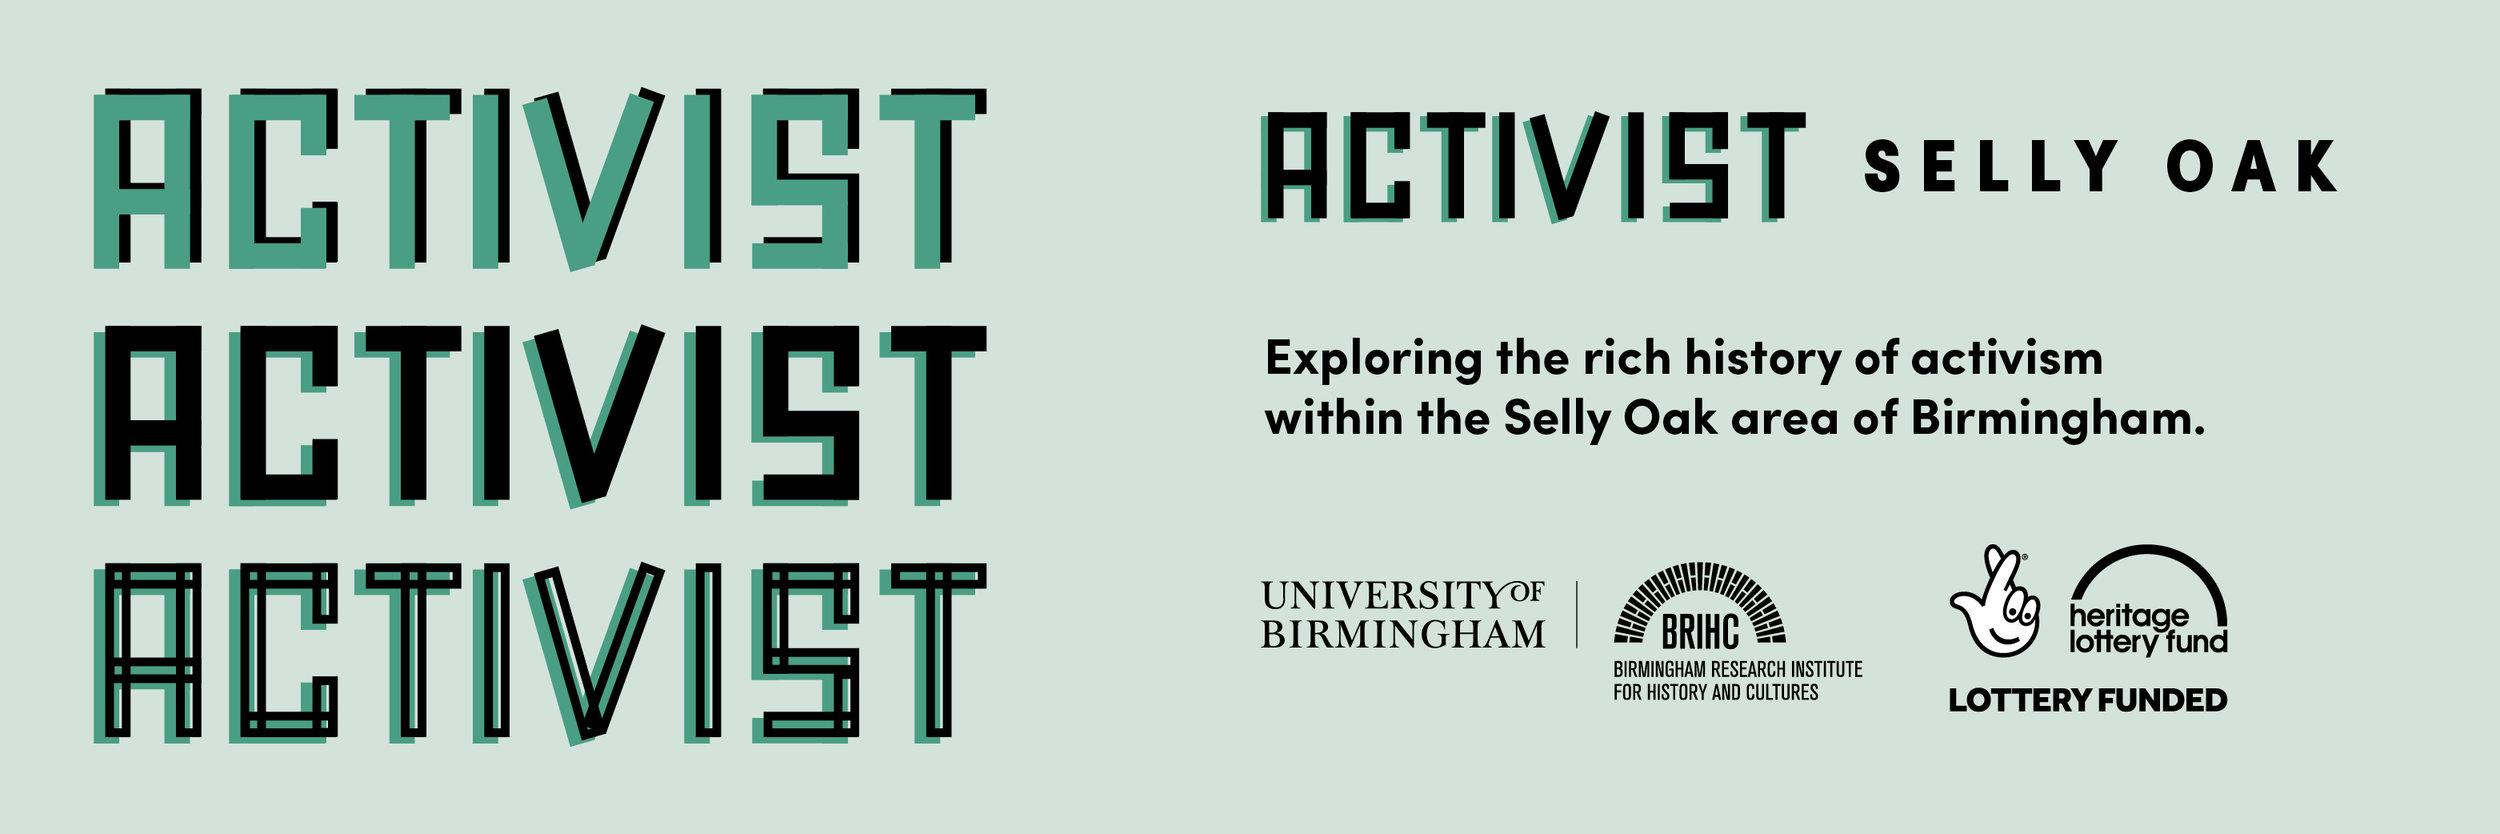 Activist Selly Oak - Twitter background image.jpg